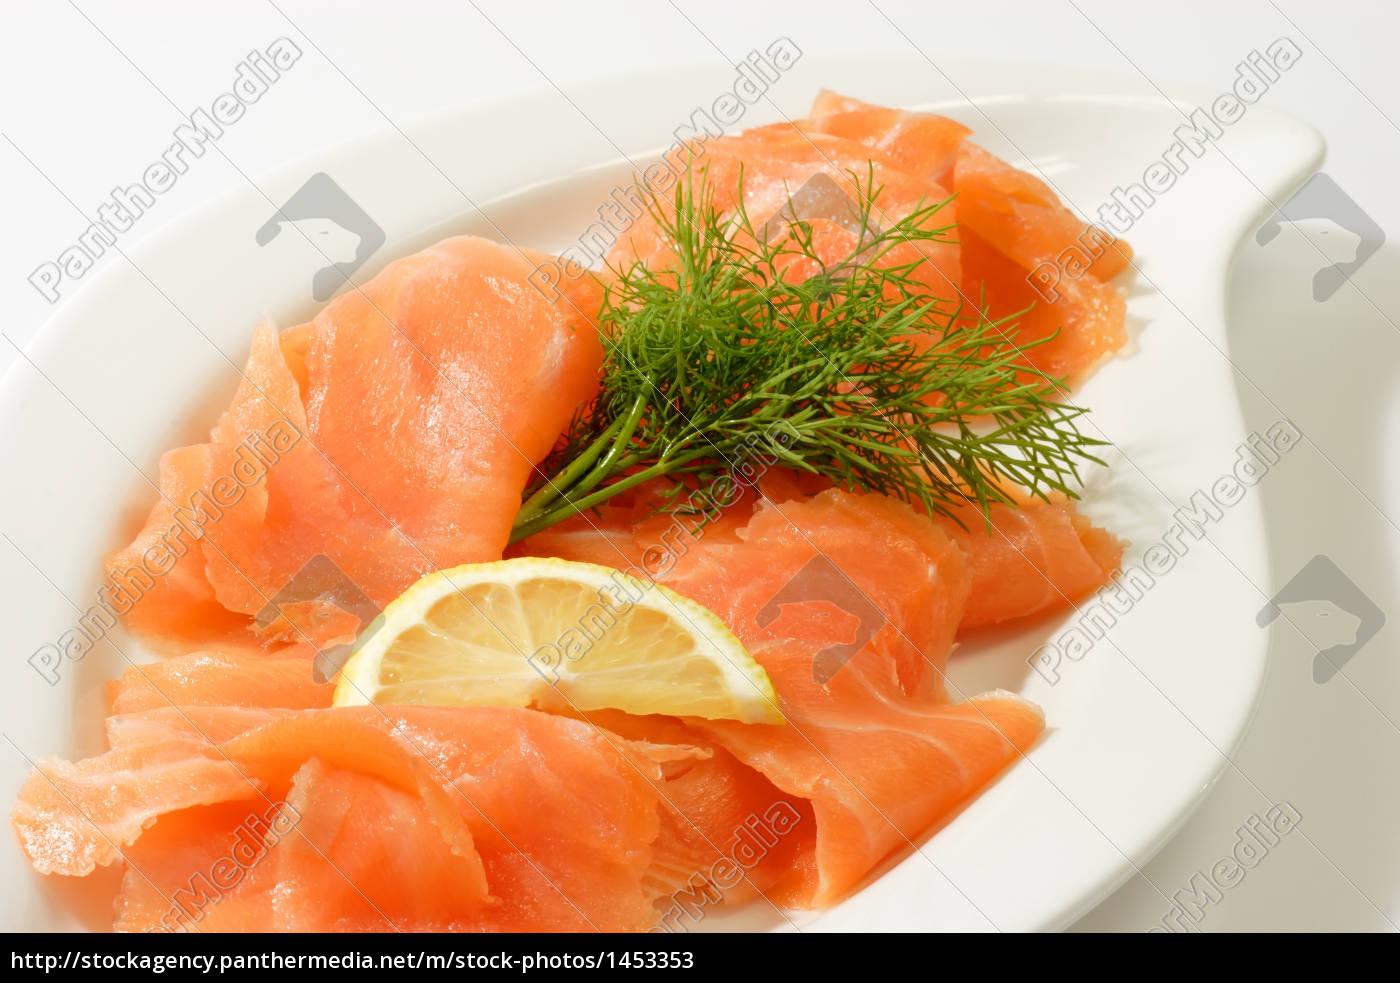 salmon, slices - 1453353